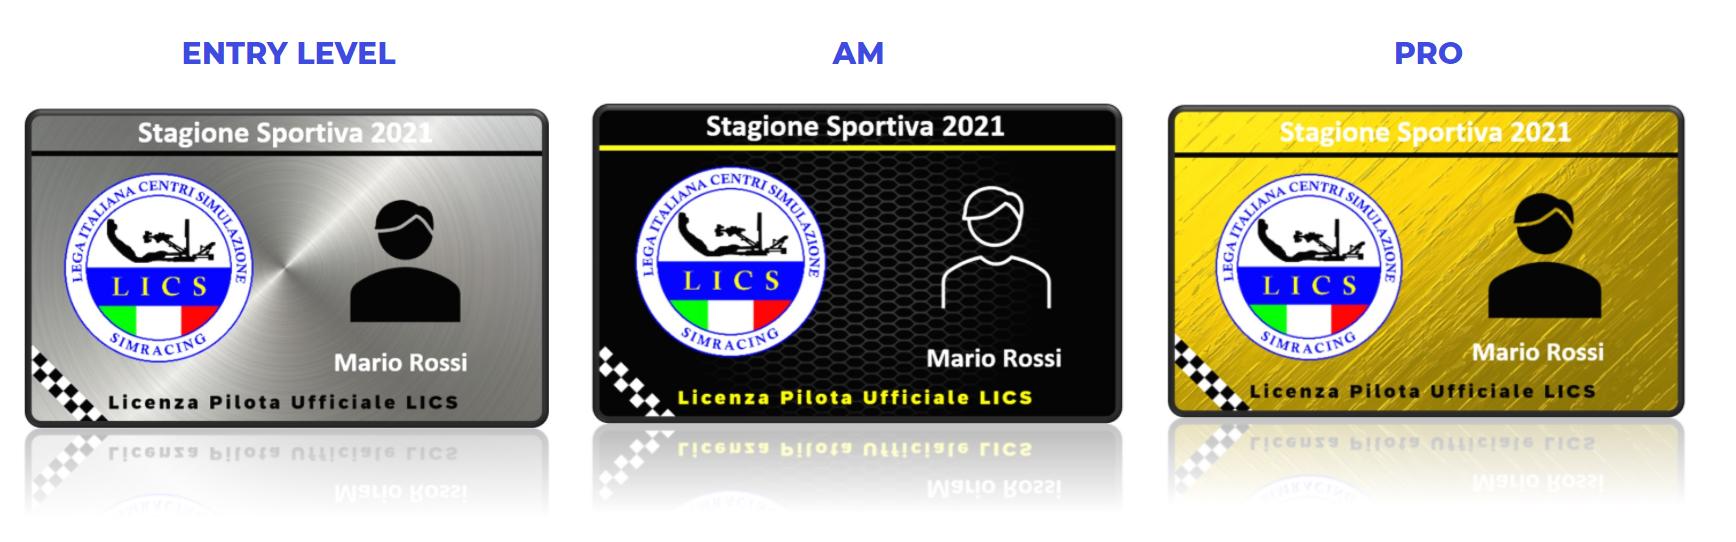 Patente Pilota LICS - Licenza Piloti Simulatori di Guida Professionale